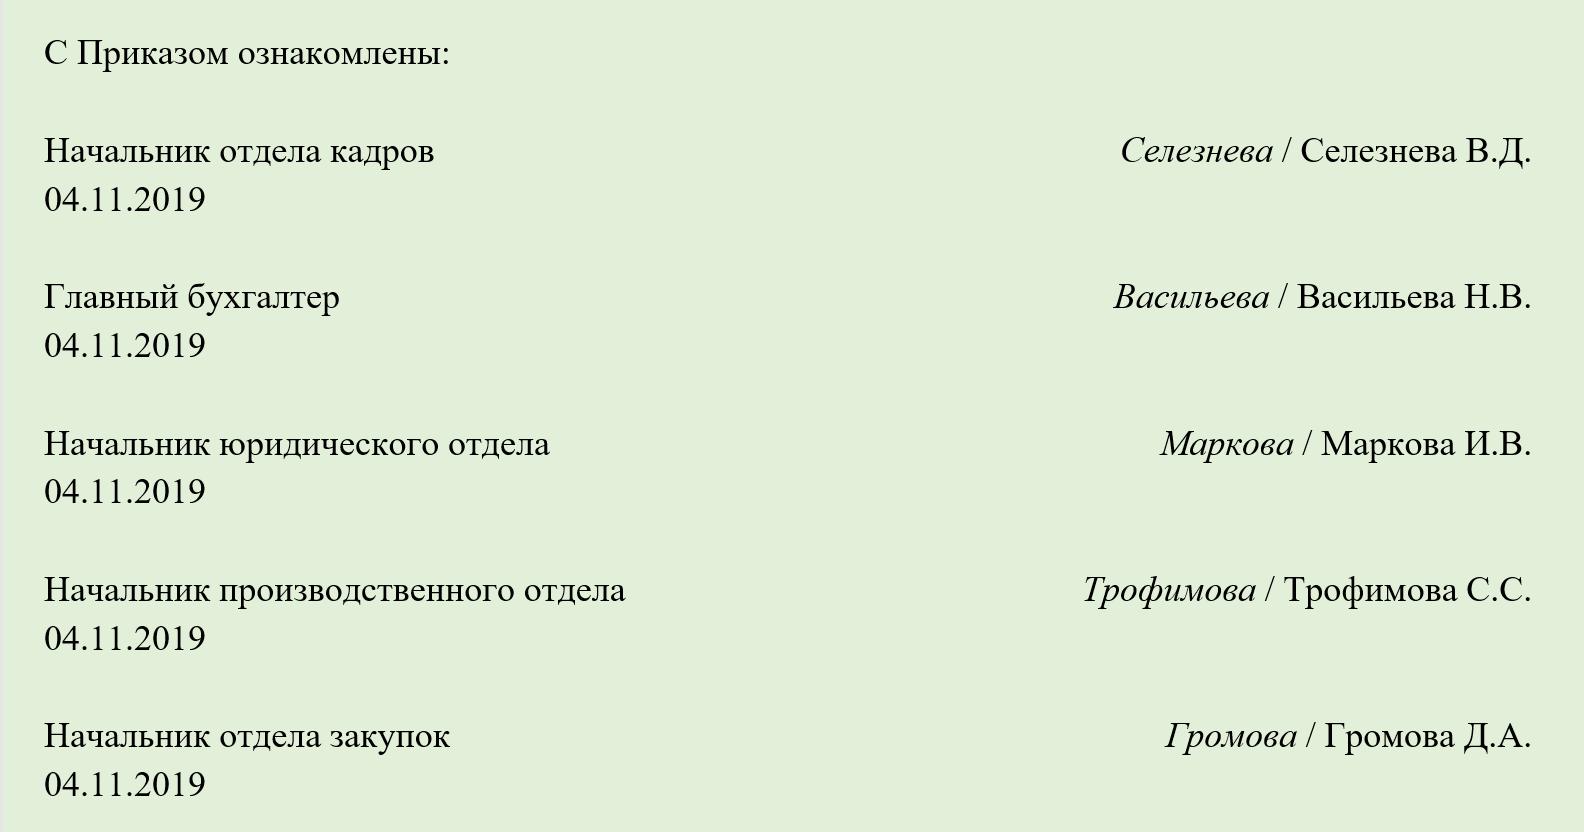 Приказ о подготовке графика отпусков-2